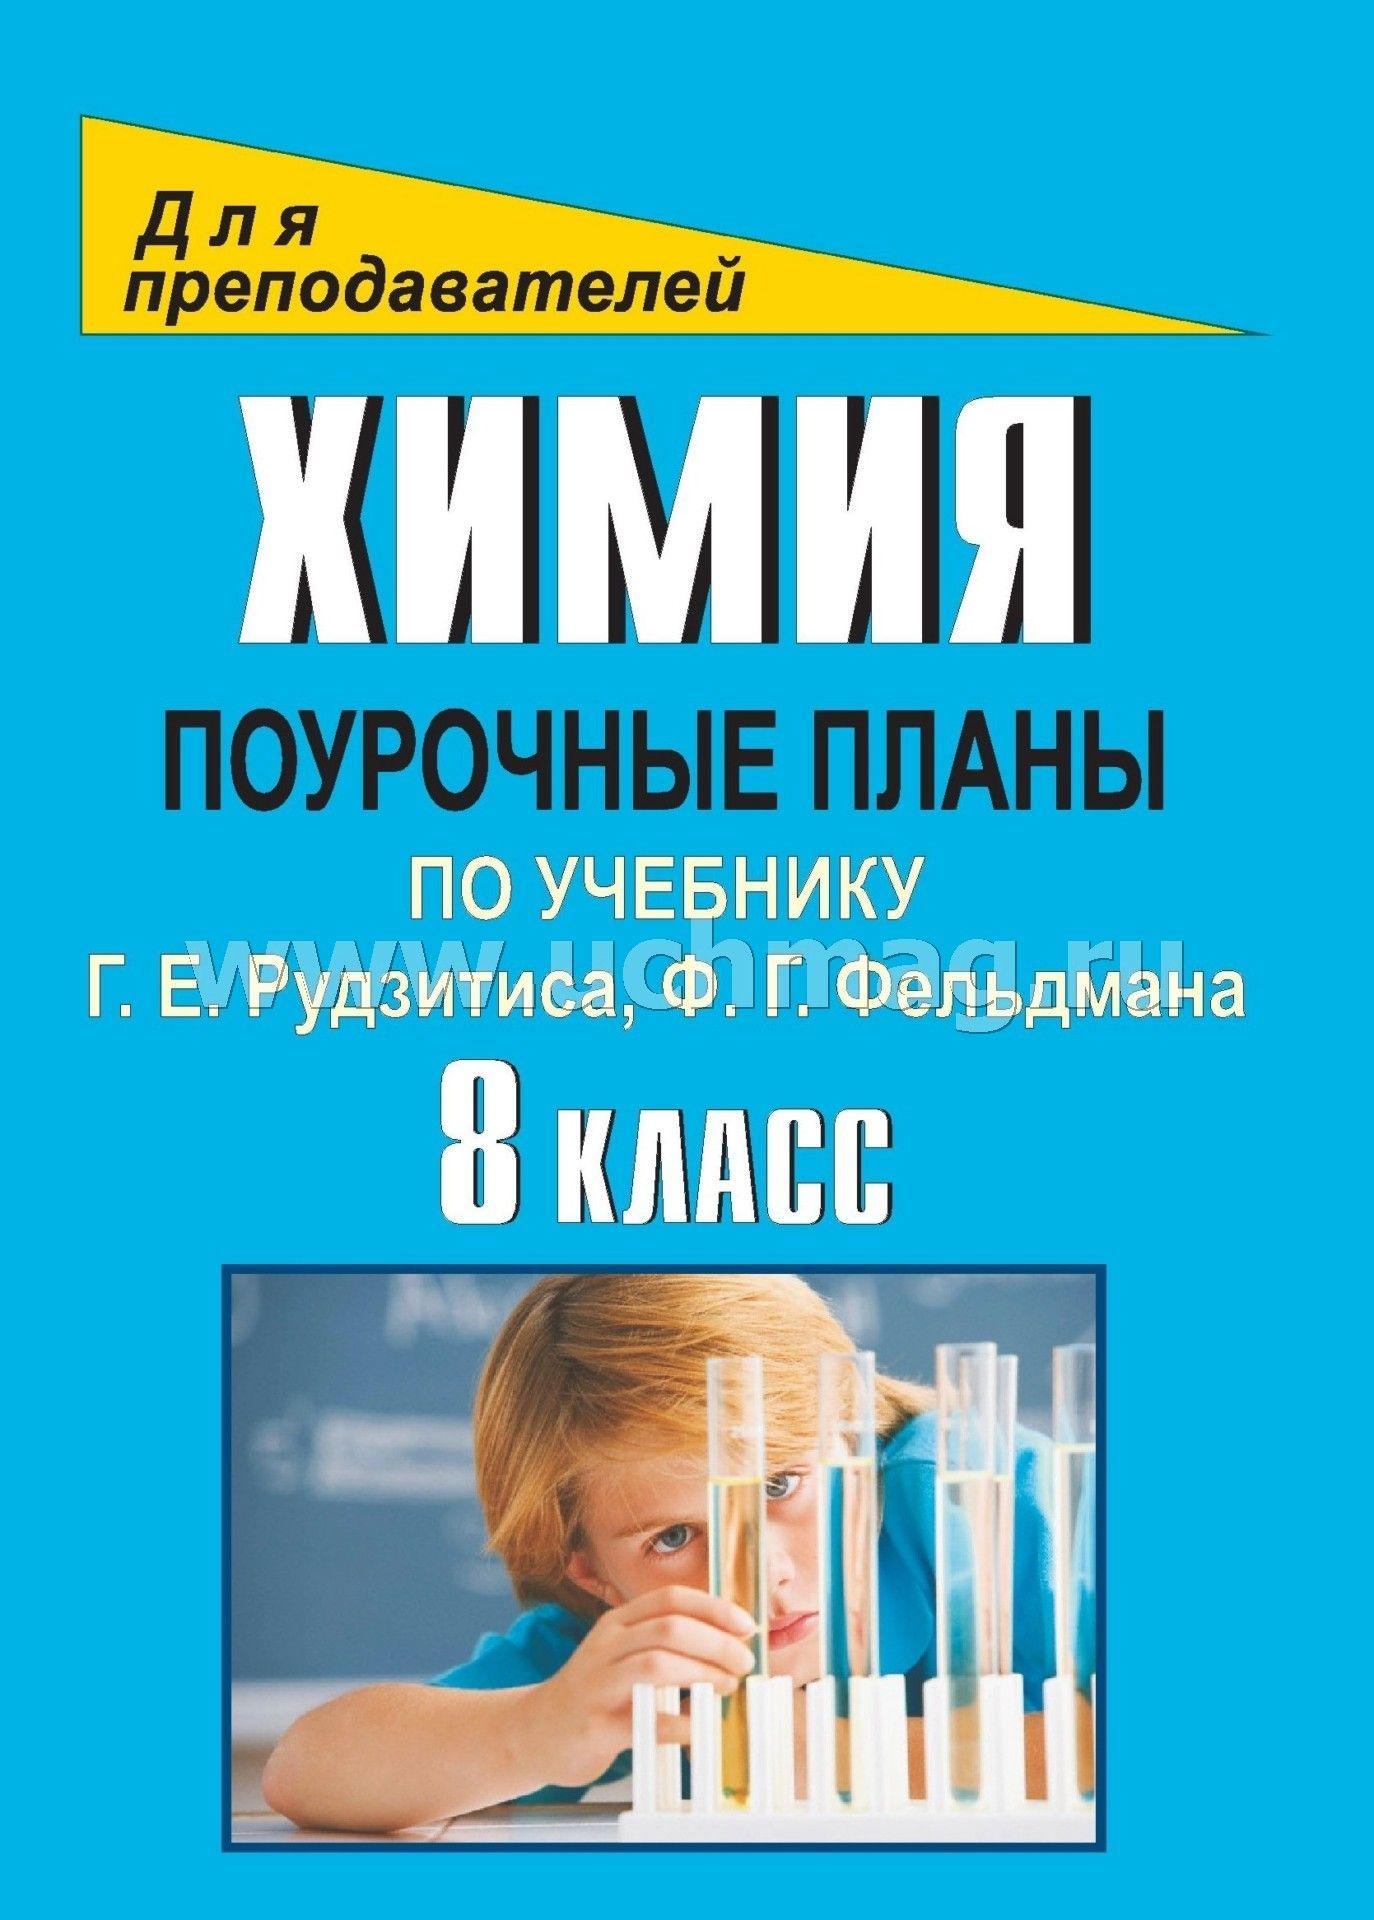 Гдз 4 класс русский язык е.и.лобчук с.92-93правило